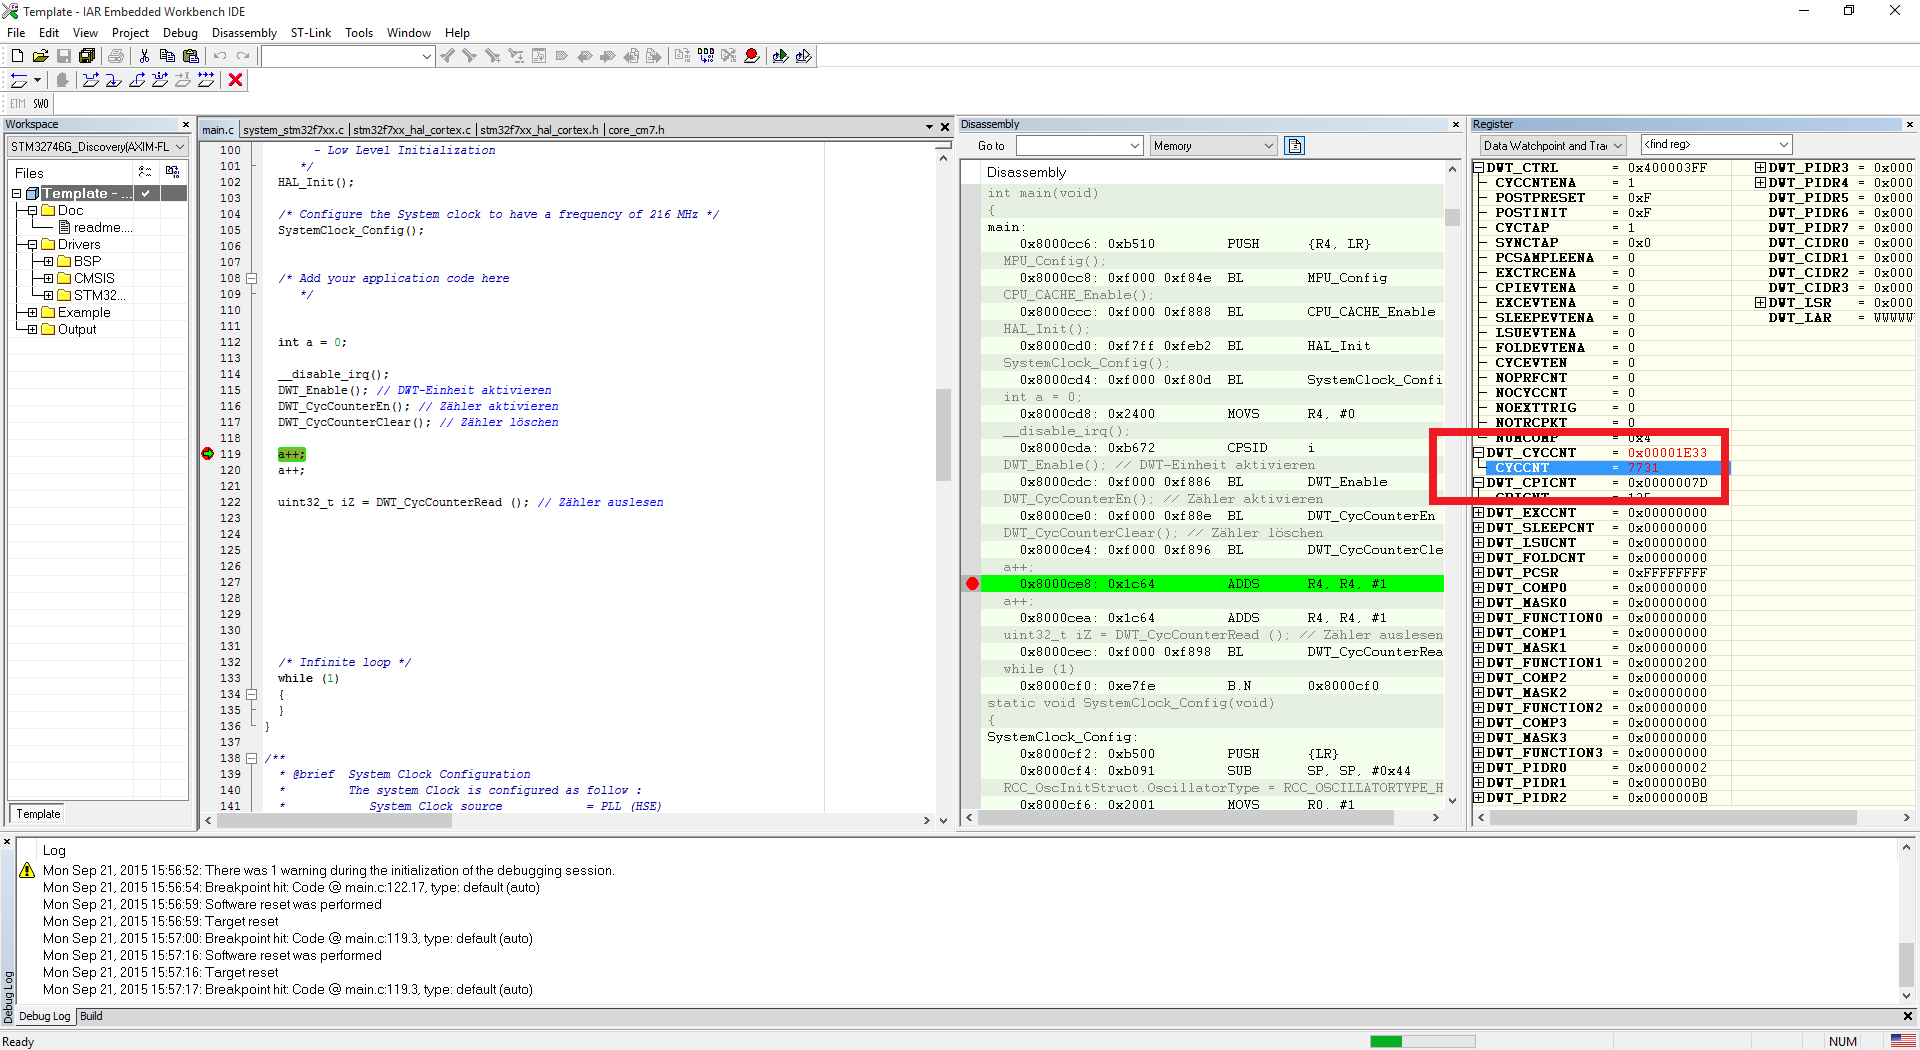 Cortex M7 und Cycle Counter (DWT) - Mikrocontroller net